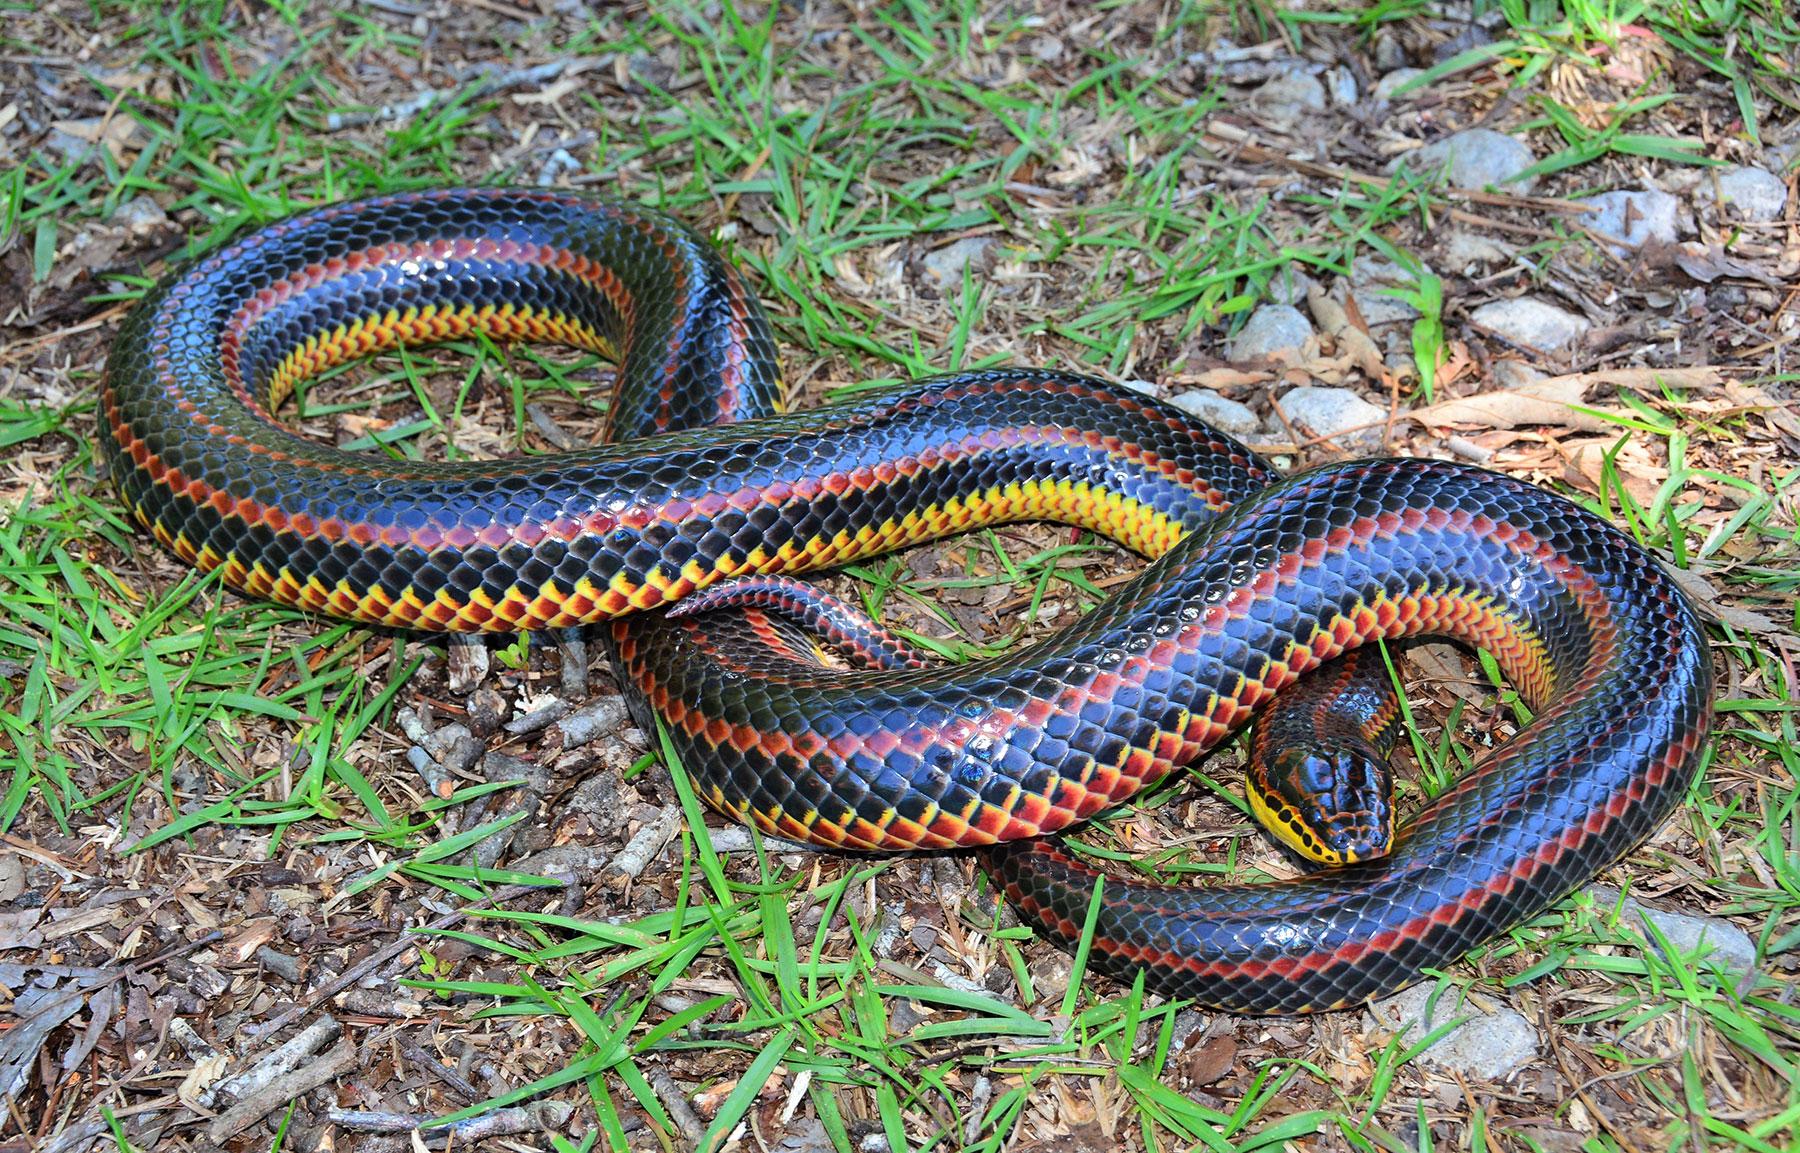 Rainbow Snake U2013 Florida Snake ID Guide